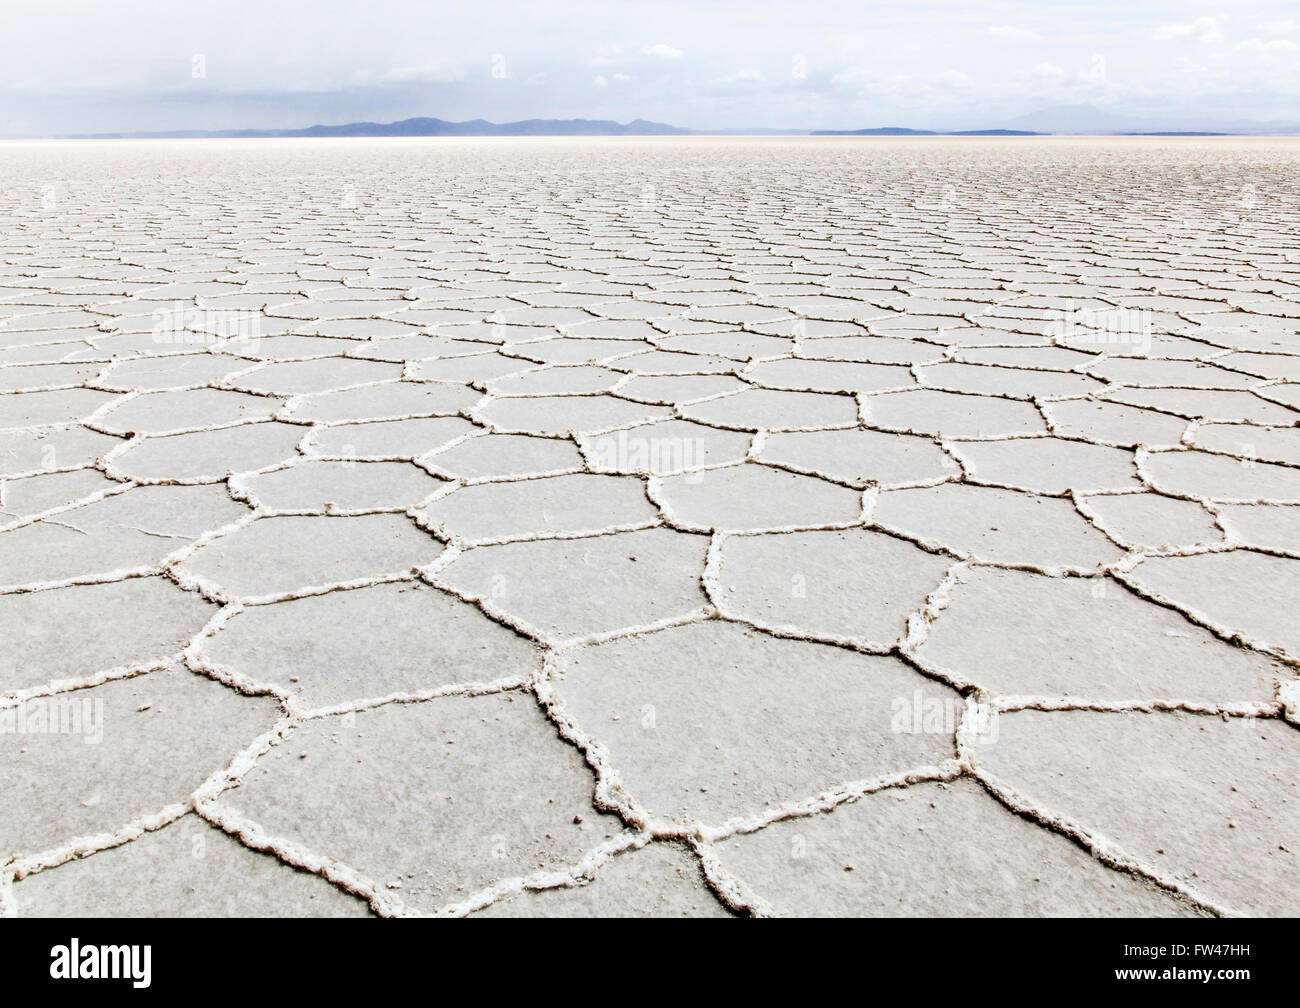 Salts flats, Uyuni, Bolivia - Stock Image